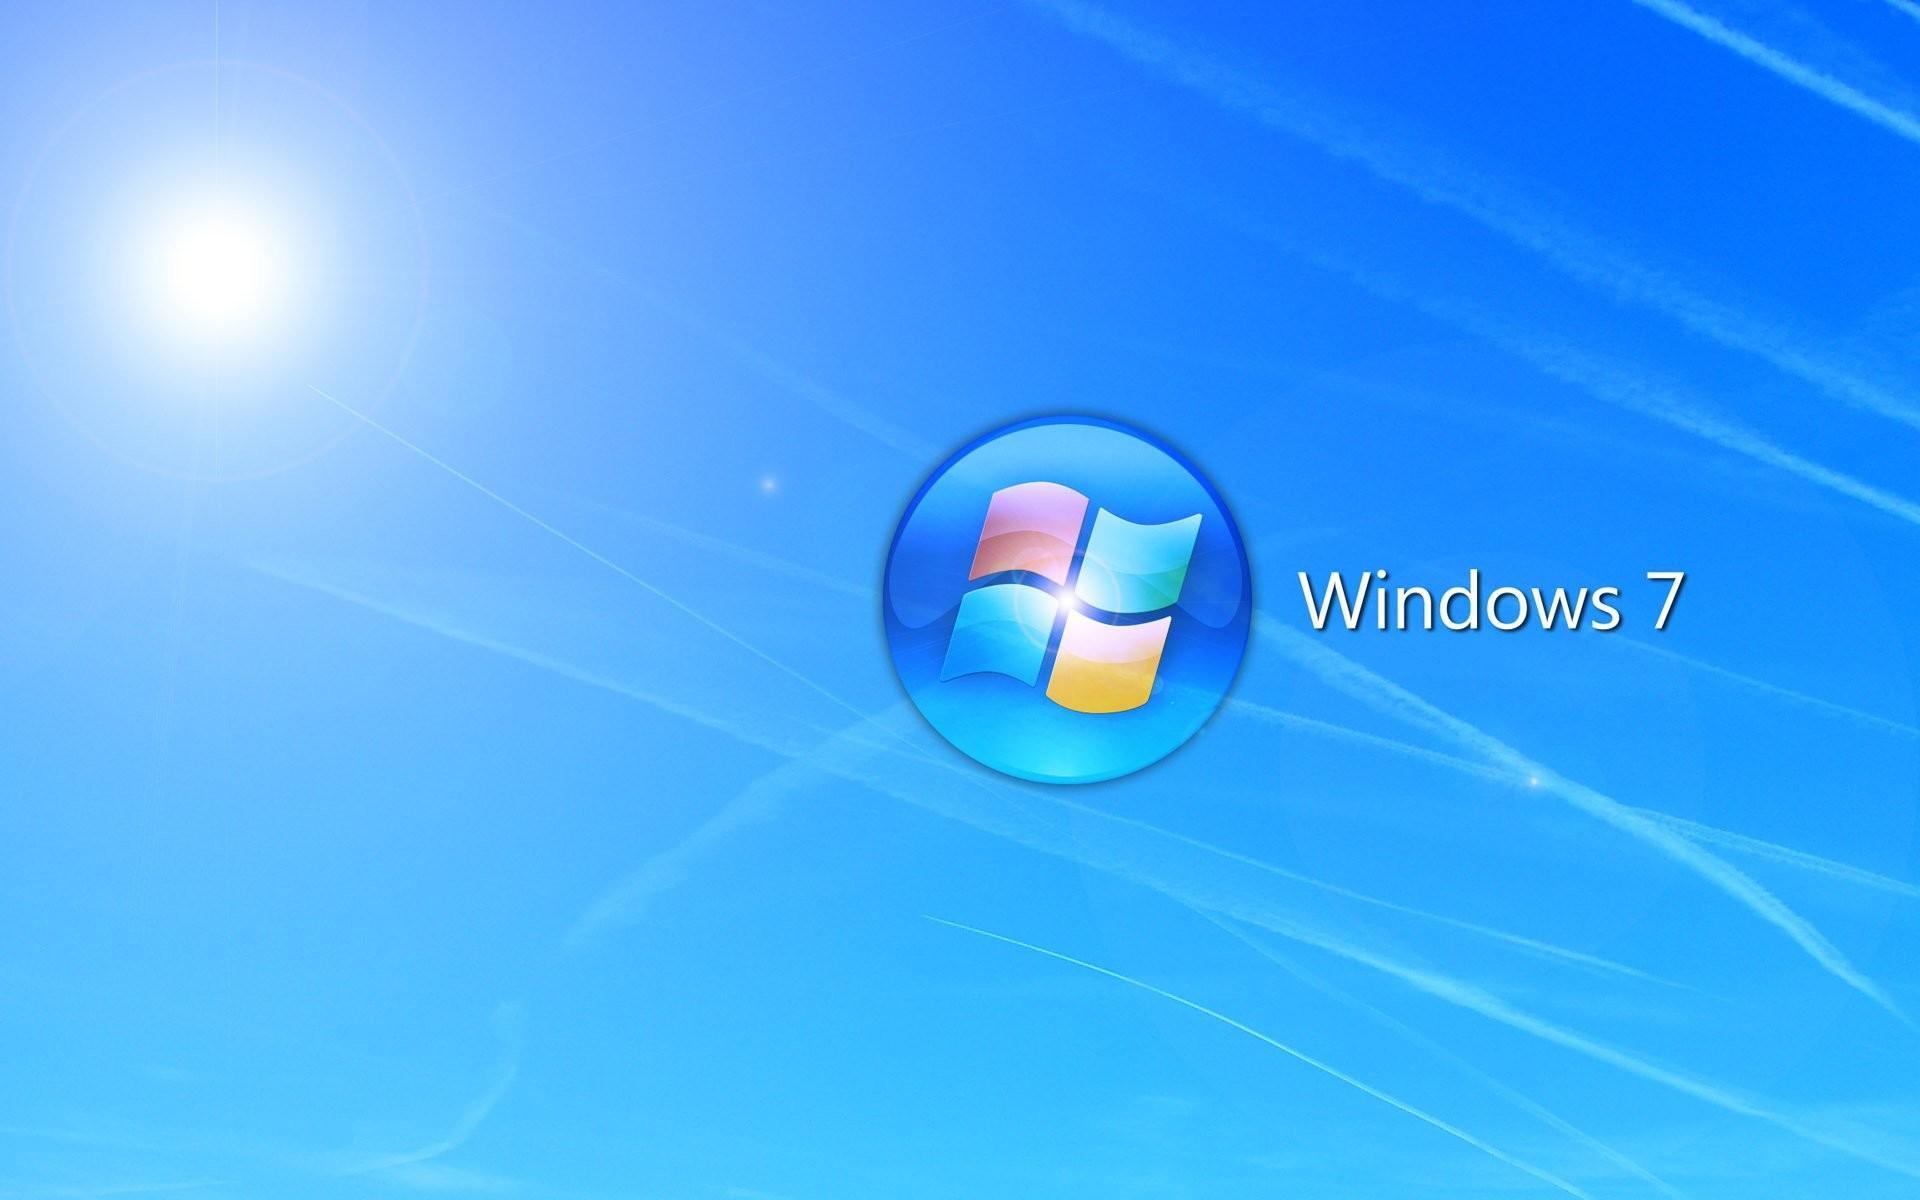 Res: 1920x1200, Windows 7 HDTV 1080p